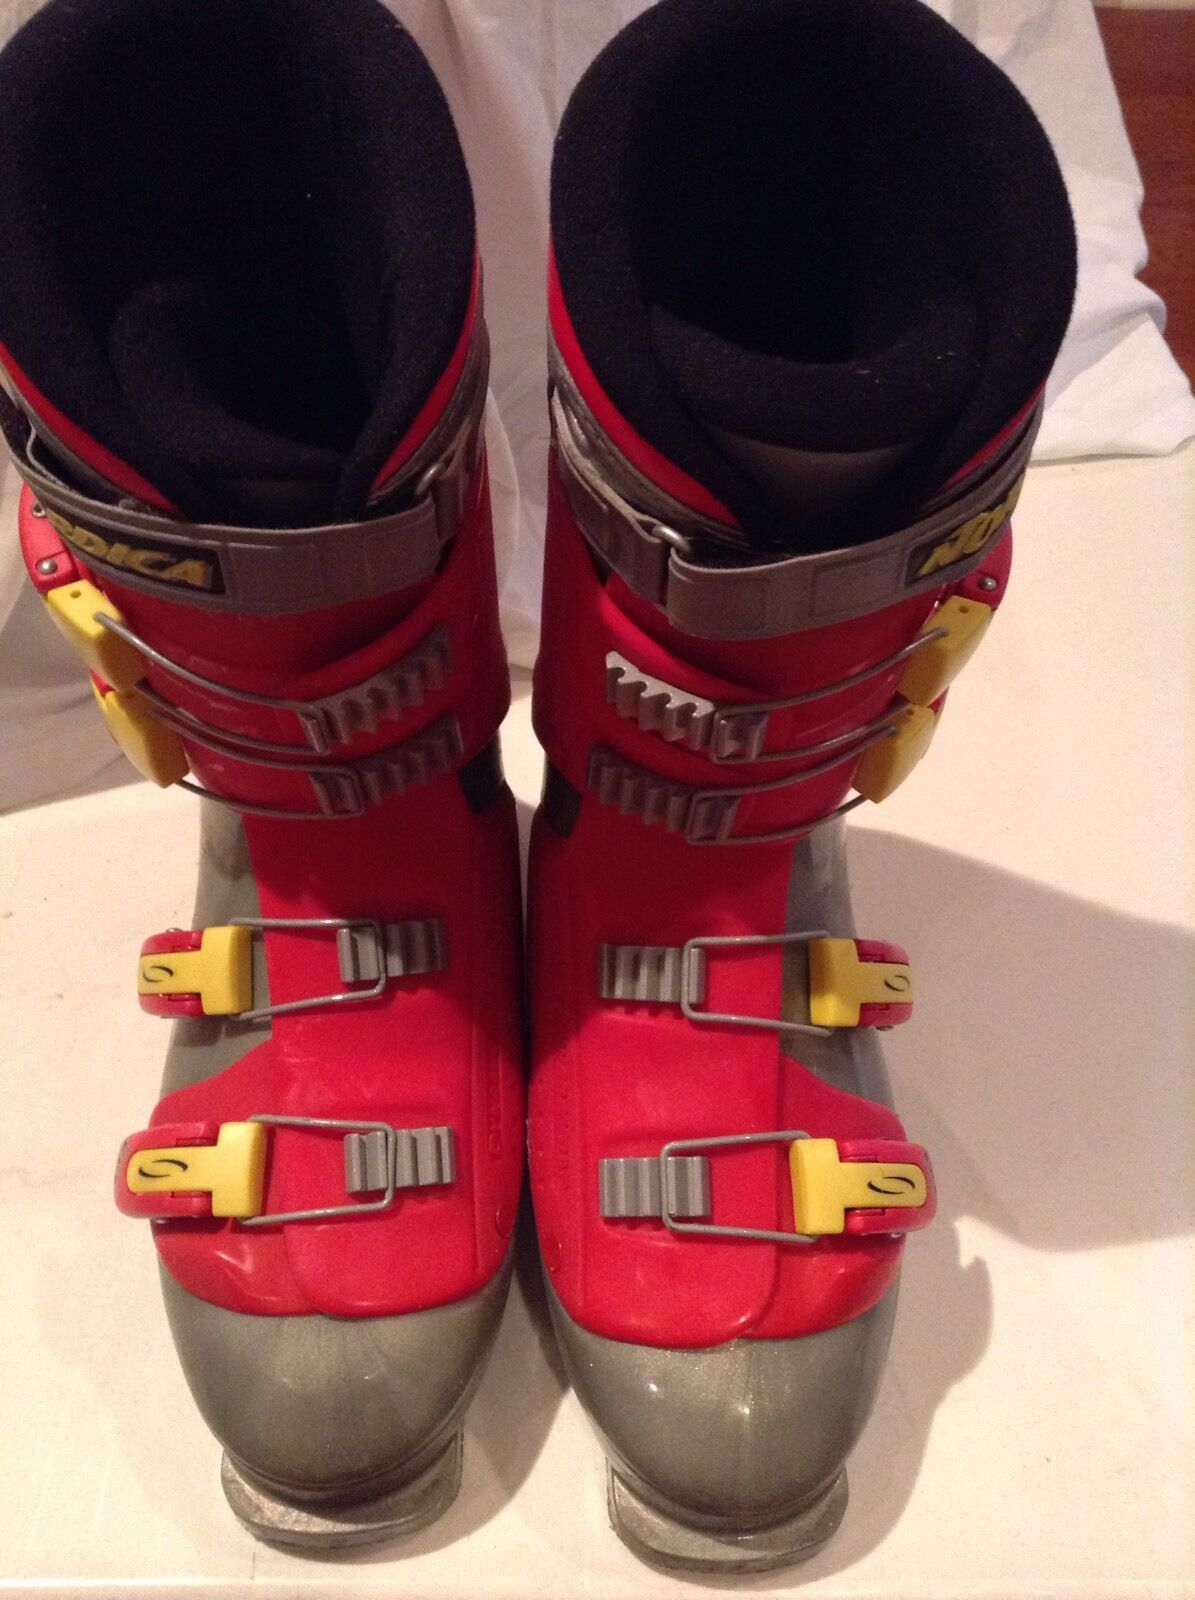 Nordica greenech 55 Men's Ski Boots